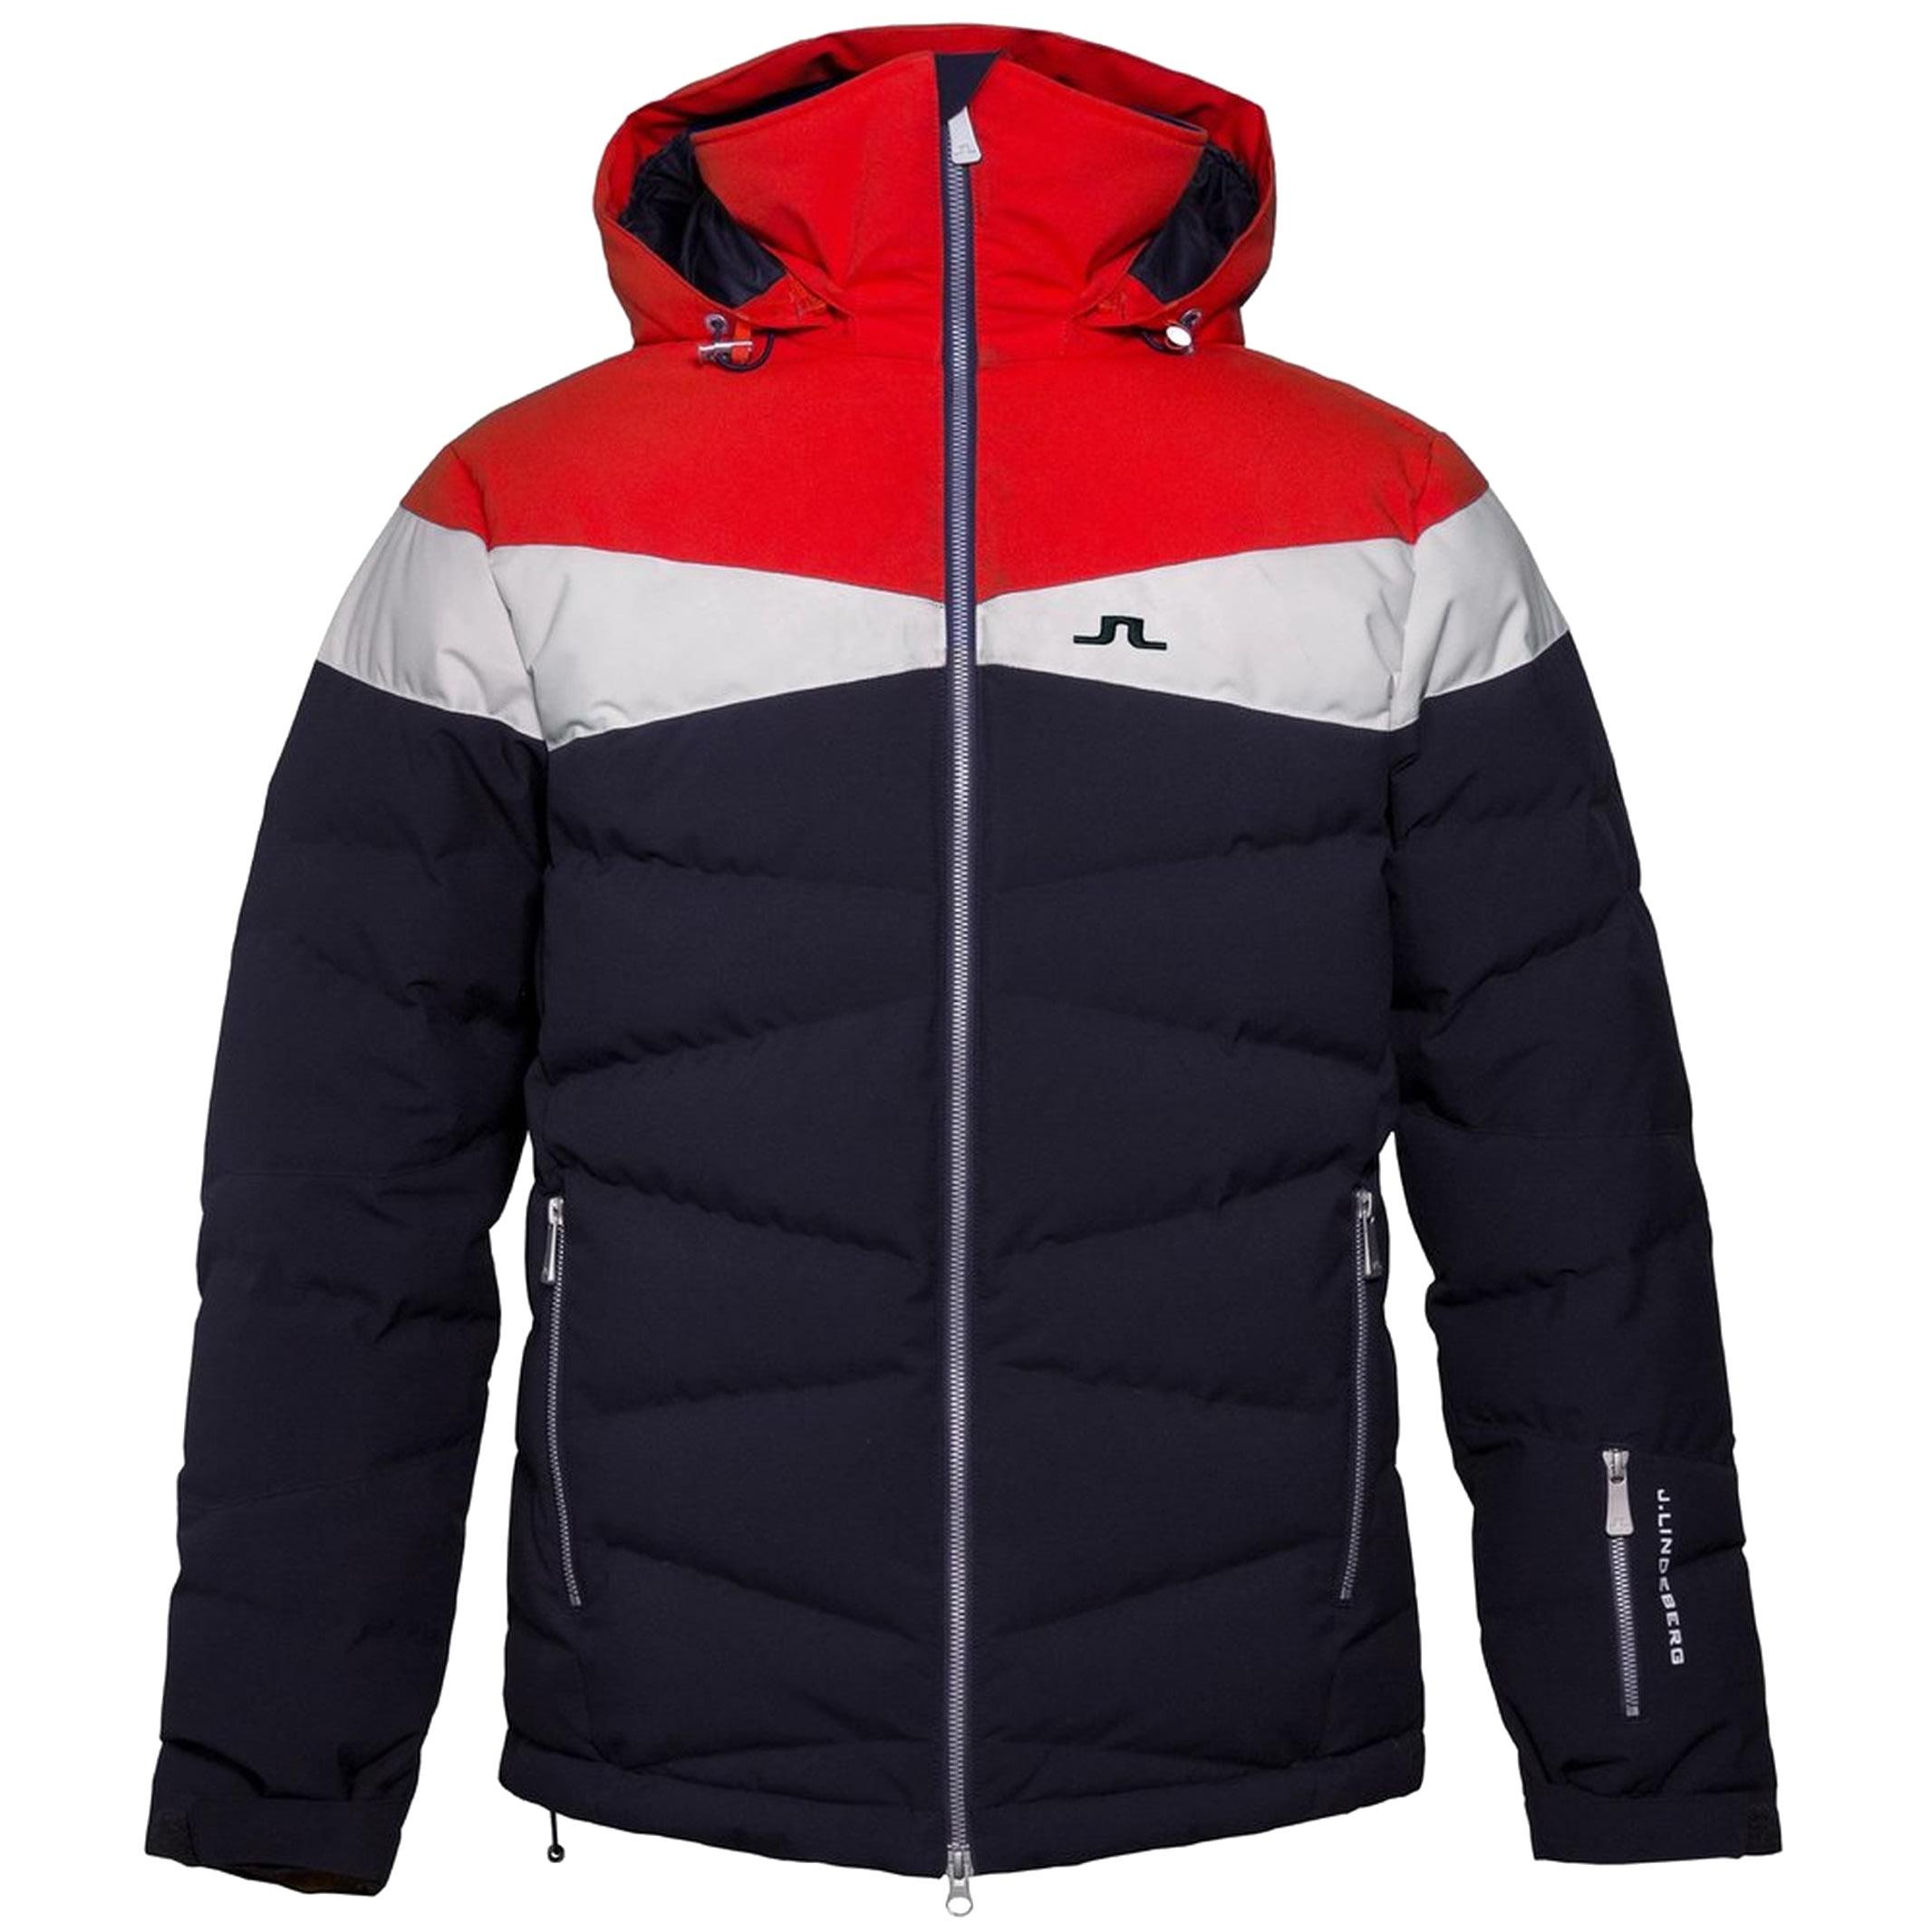 Men's Crillon JL 2 layer Down Jacket